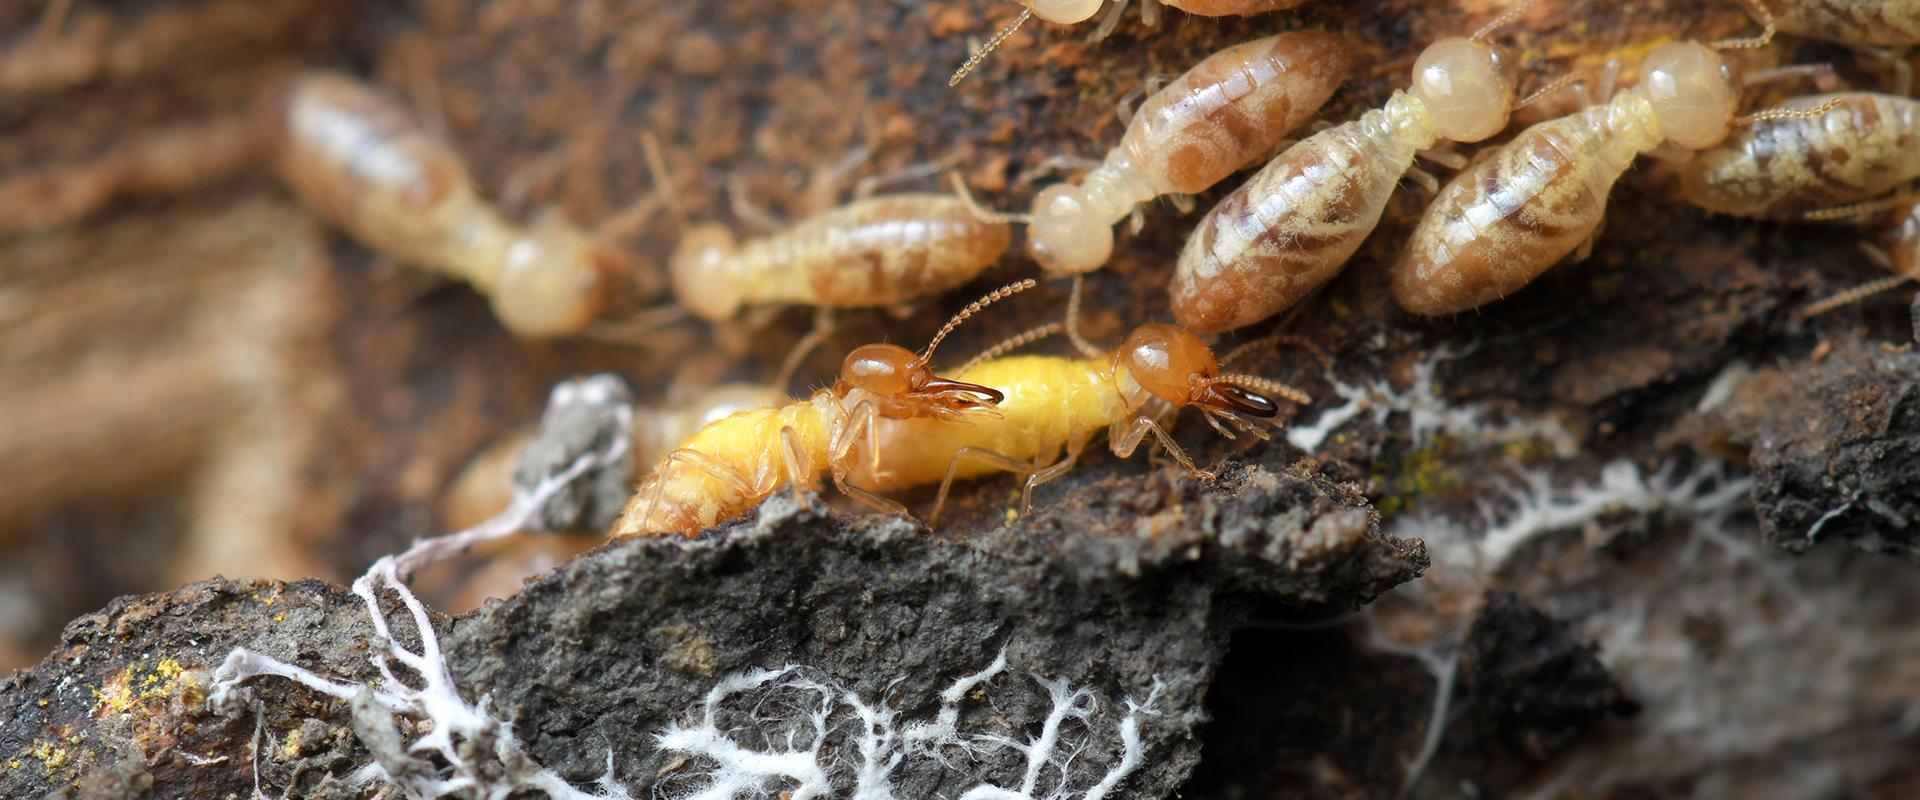 subterranean termites damaging wood